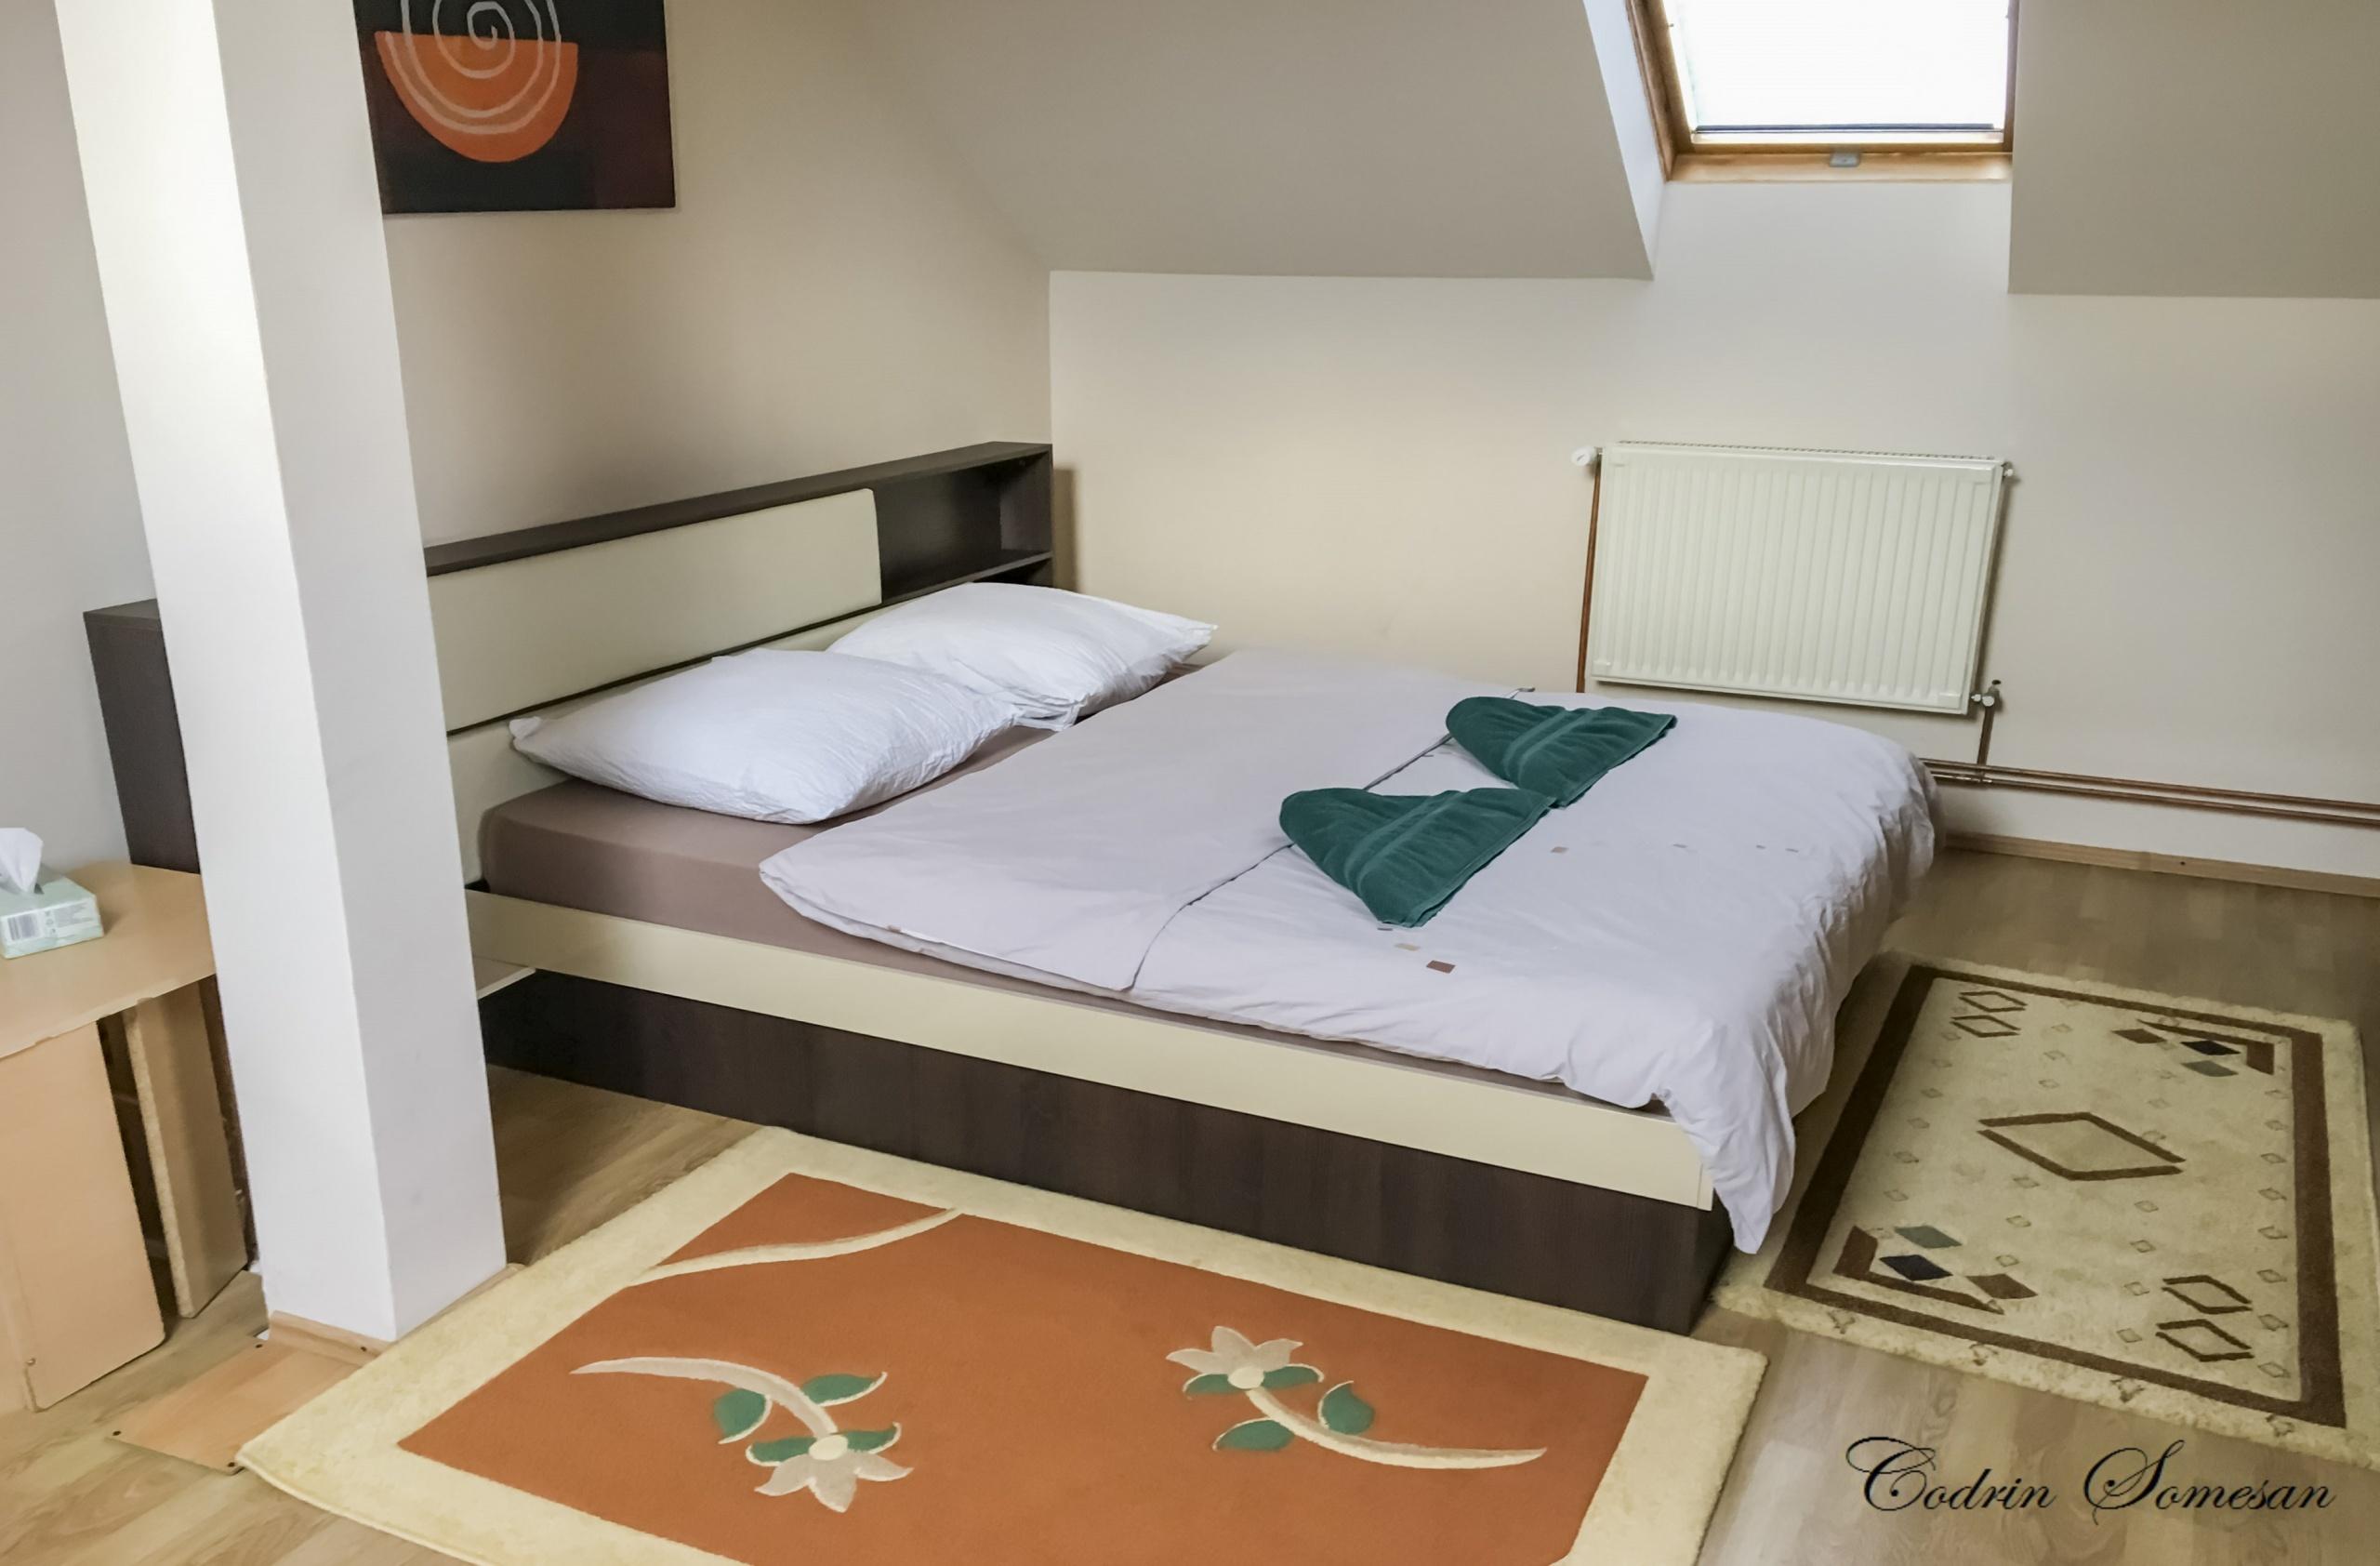 Cazare / Booking la Apartament Kappa Bistrita